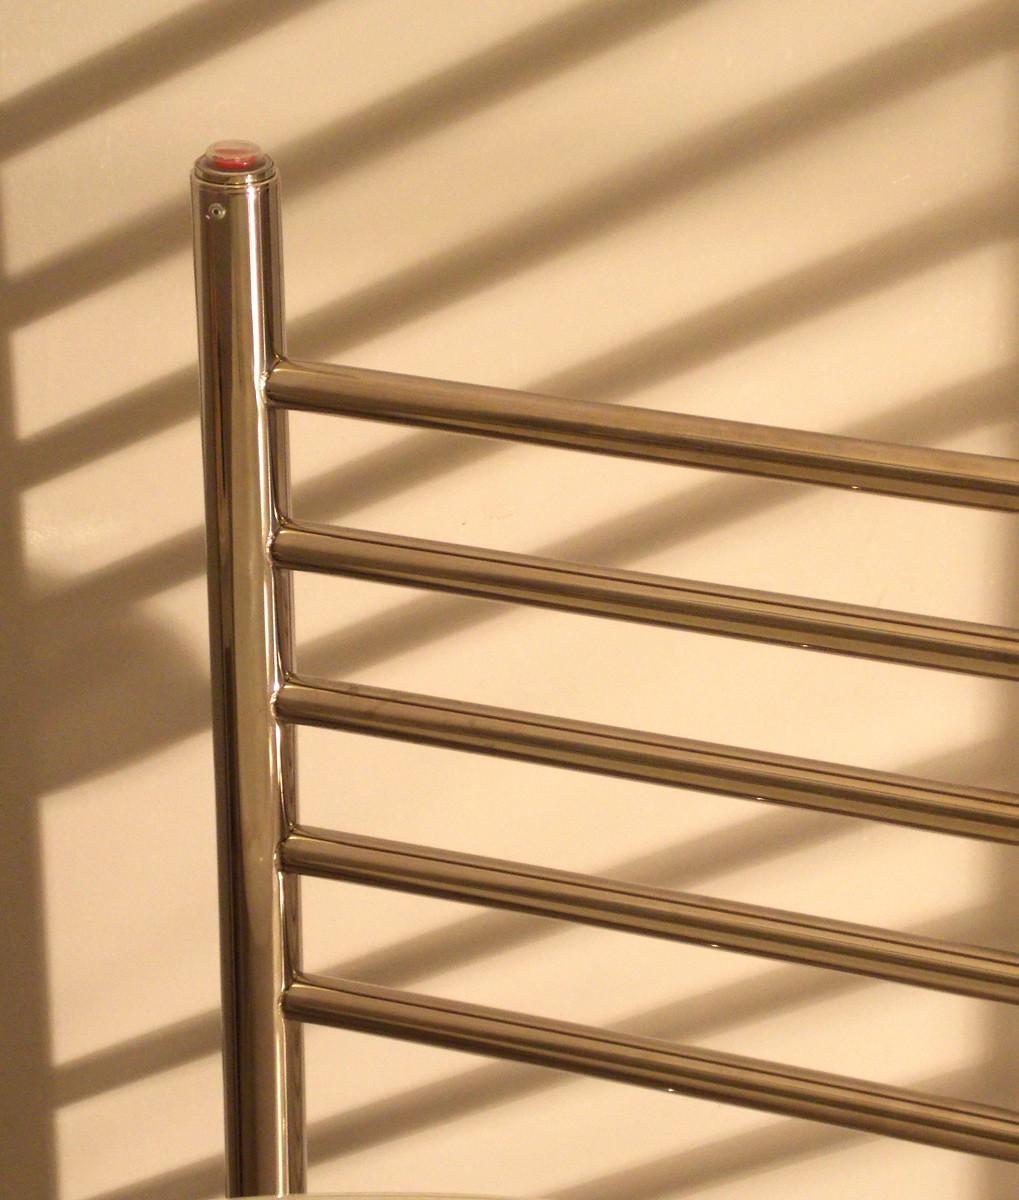 Amba Towel Warmers | Electric Towel Dryer | Heated Towel Rack Wall Mounted